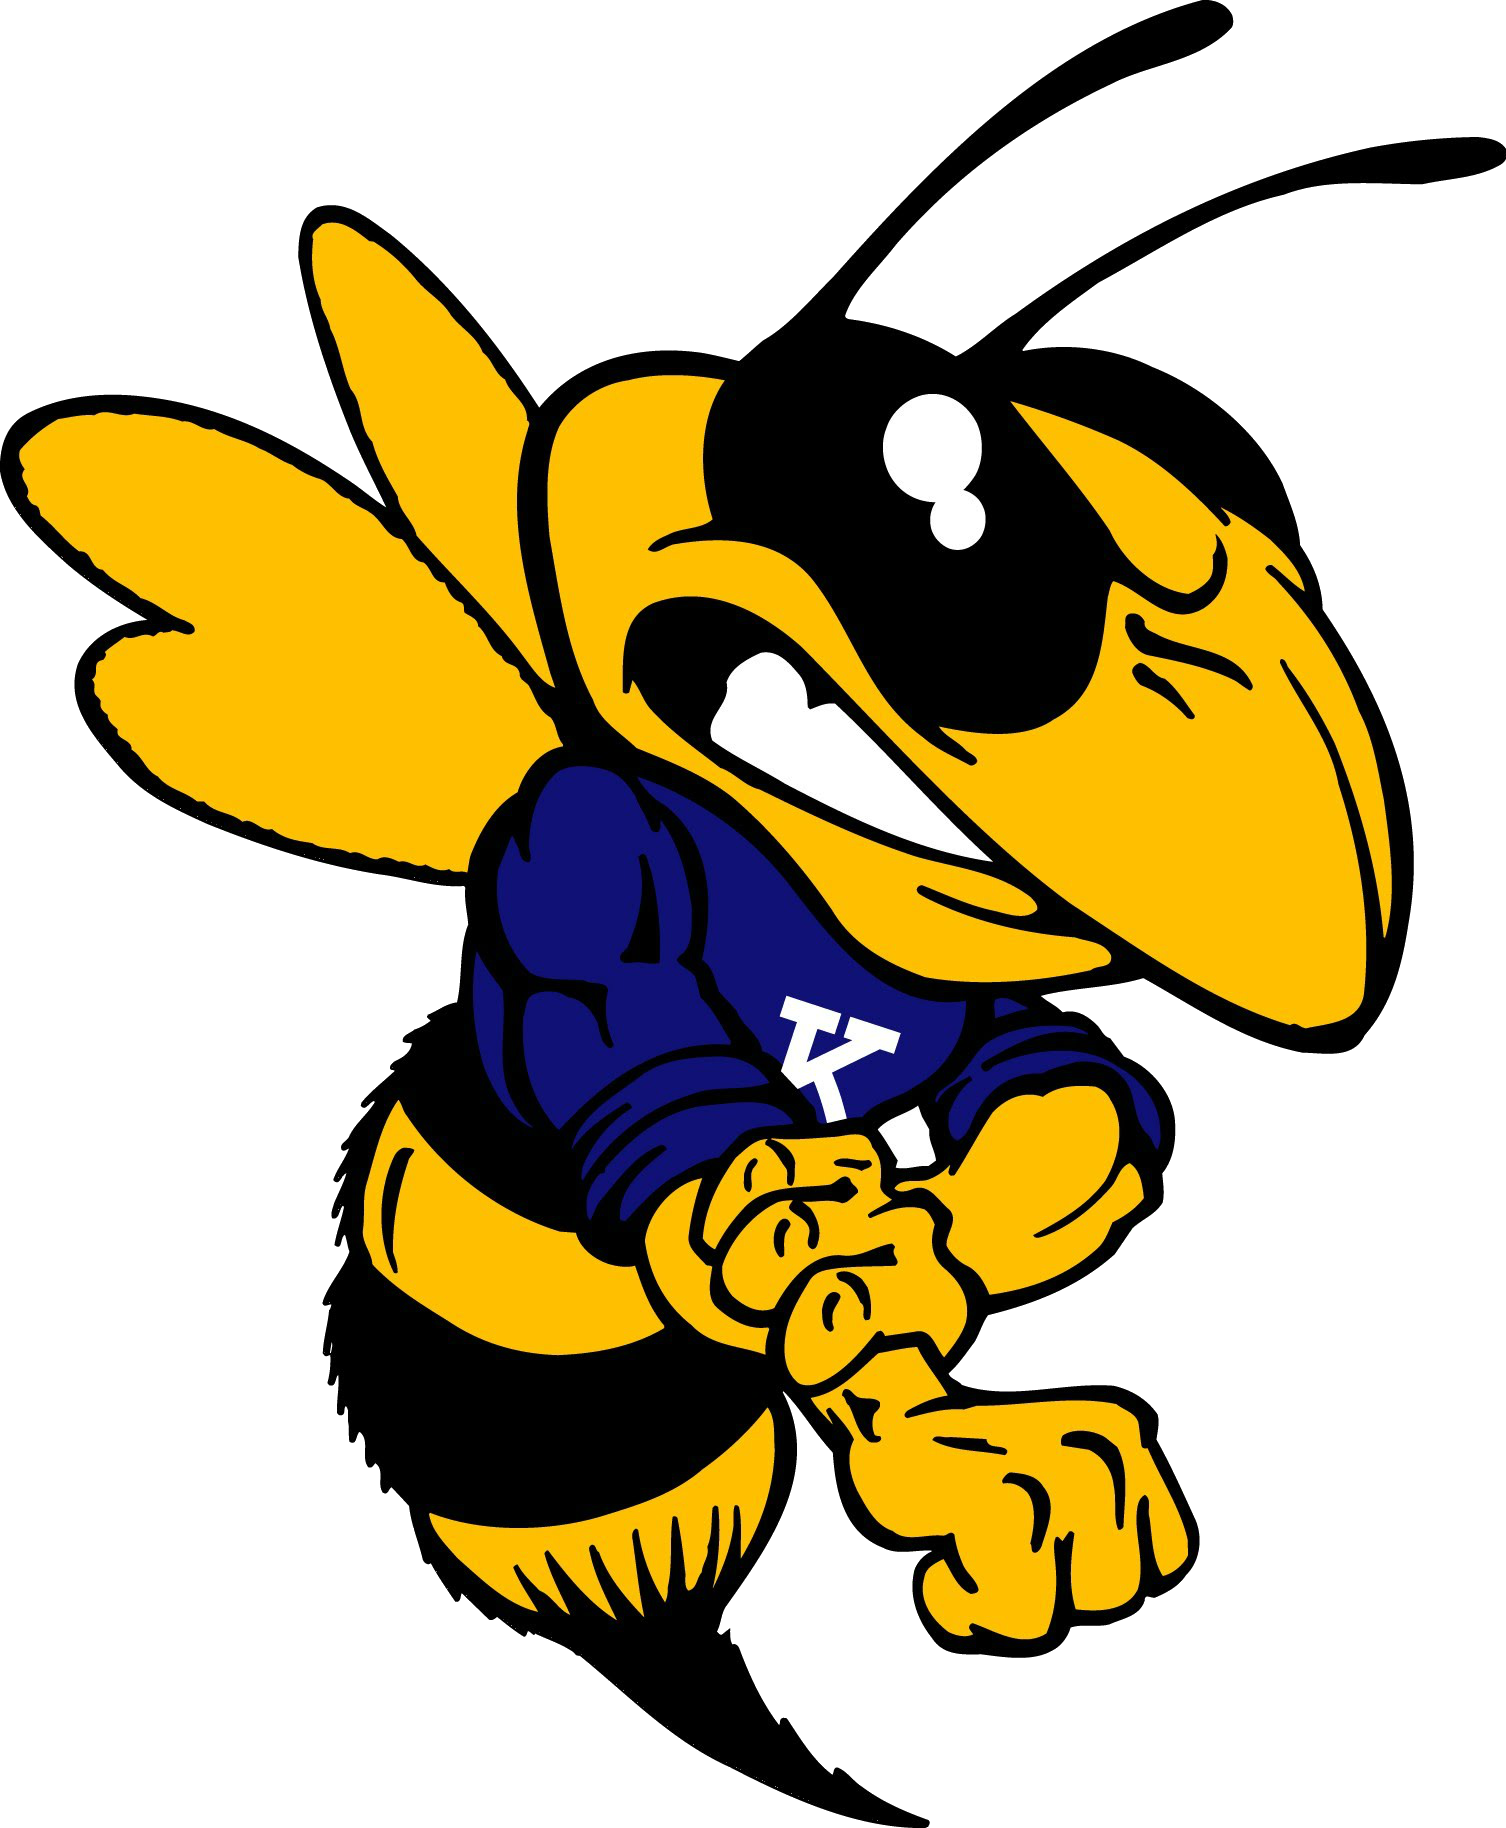 Insect clipart hornet. Kirtland football moms shop